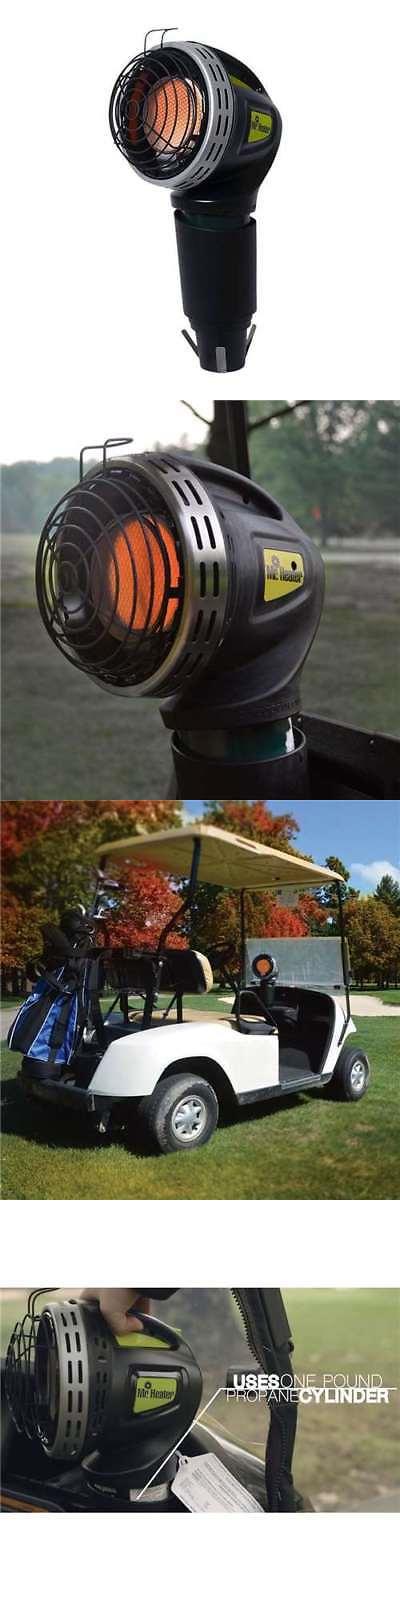 Push-Pull Golf Cart Add-ons 72671: Mr. Heater 4000 Btu Propane ... on golf caddy cup holder, golf bag cup holder, golf pull cart tires, clicgear cup holder, golf pull cart seat, bag boy push cart cup holder,